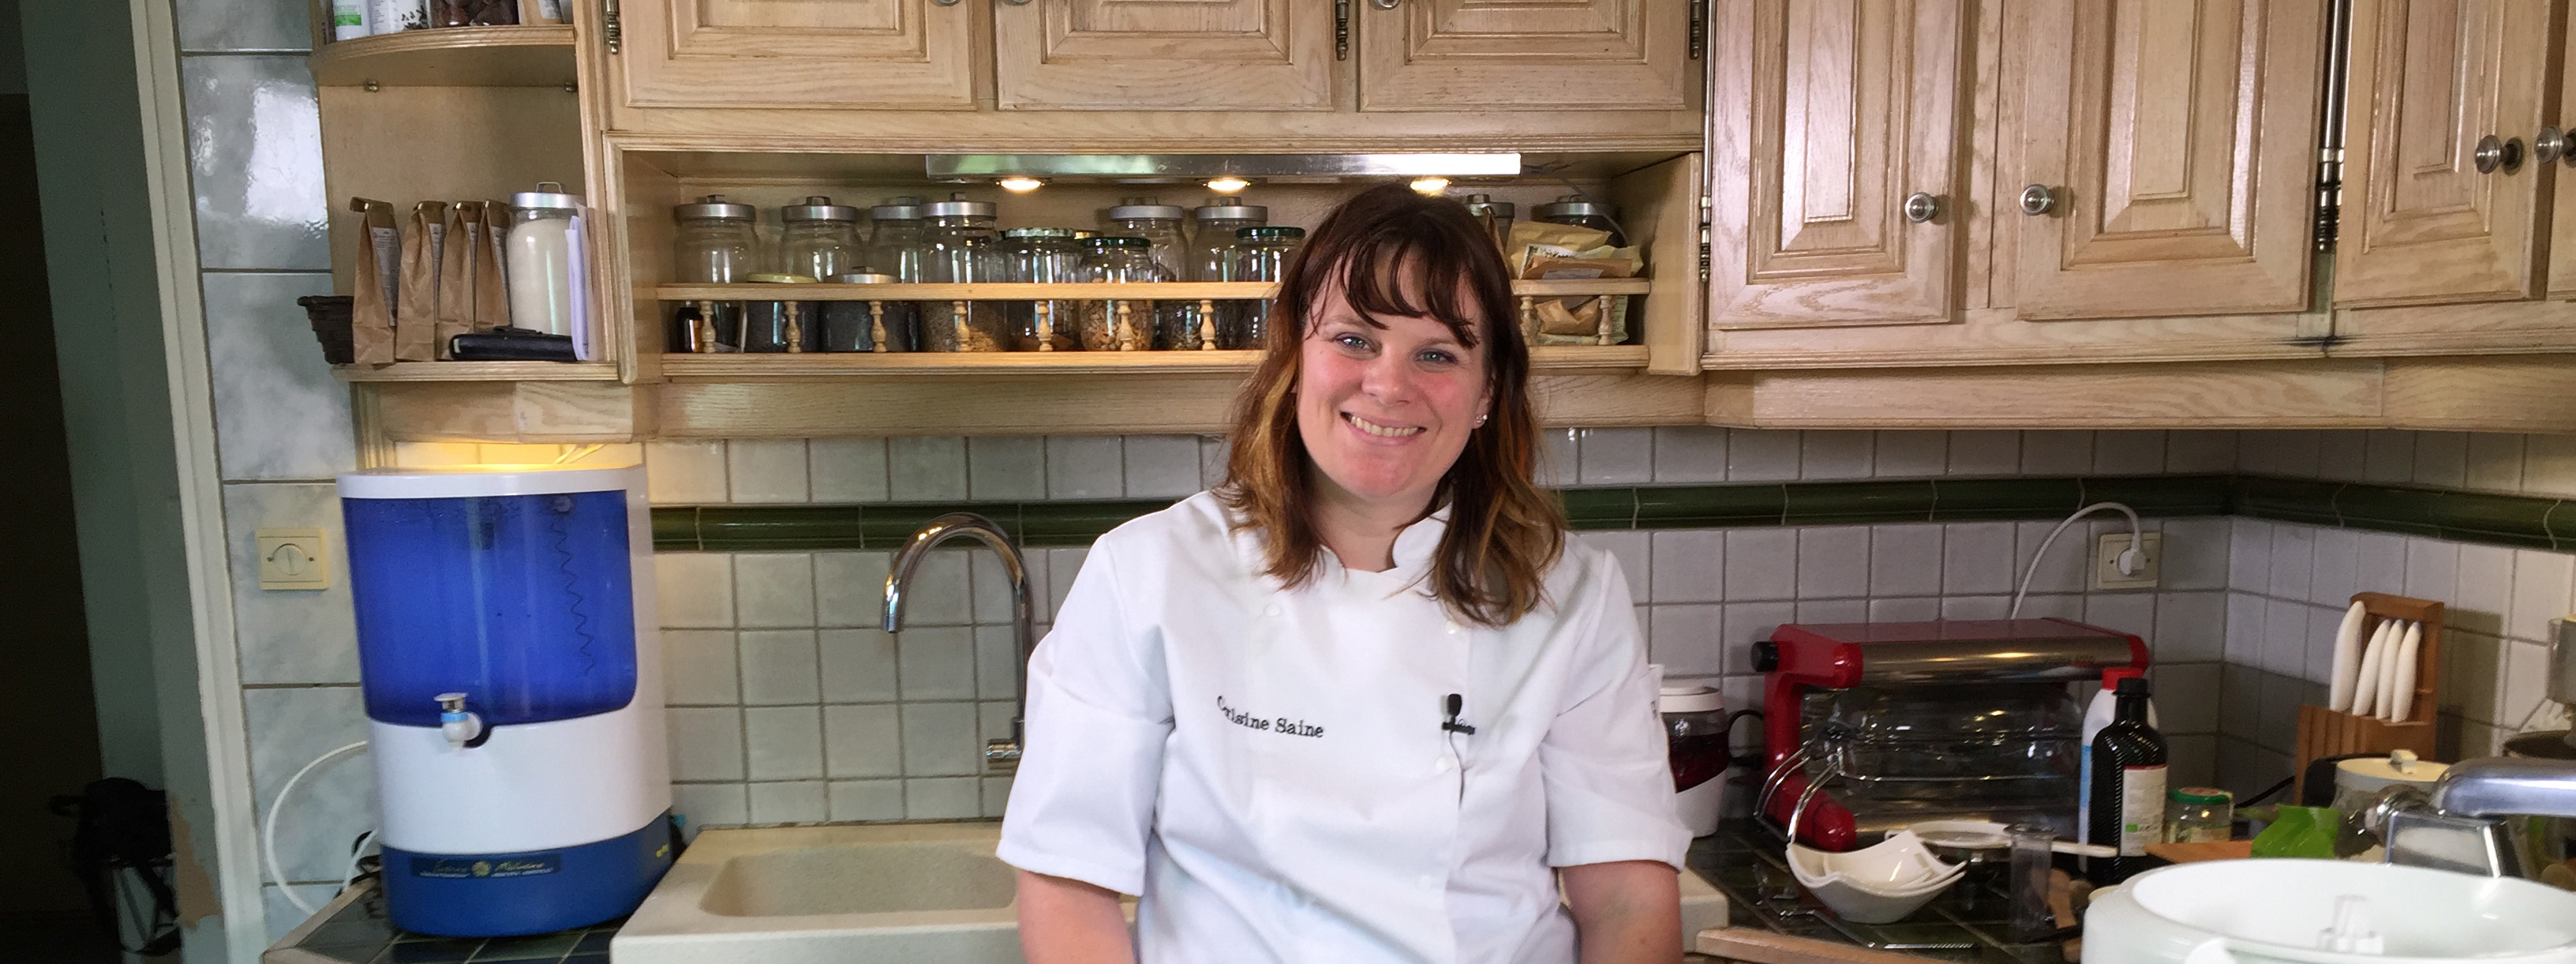 Karen Cuisine Saine - cours de cuisine en ligne